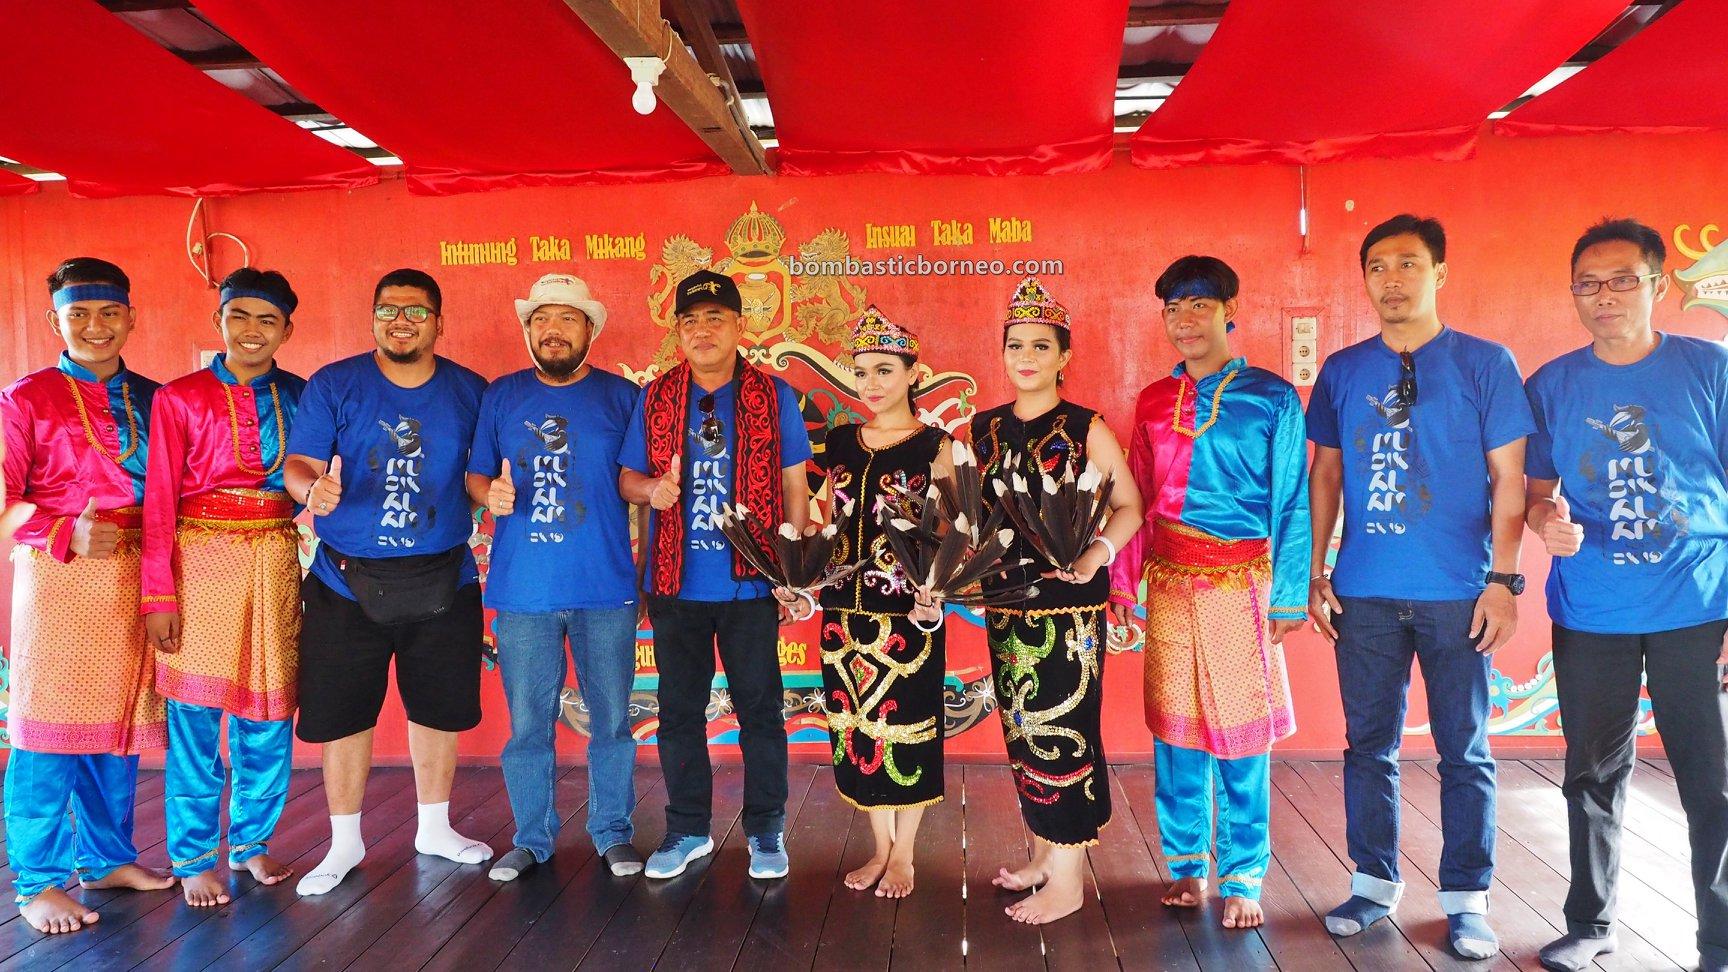 Rumah Baloy Mayo, Suku Dayak Tidung, Culture, exploration, Ethnic, native, tribe, Indonesia, North Kalimantan, Pariwisata, Tourism, Borneo, 婆罗洲印尼游踪, 北加里曼丹达雅文化, 打拉根土著部落